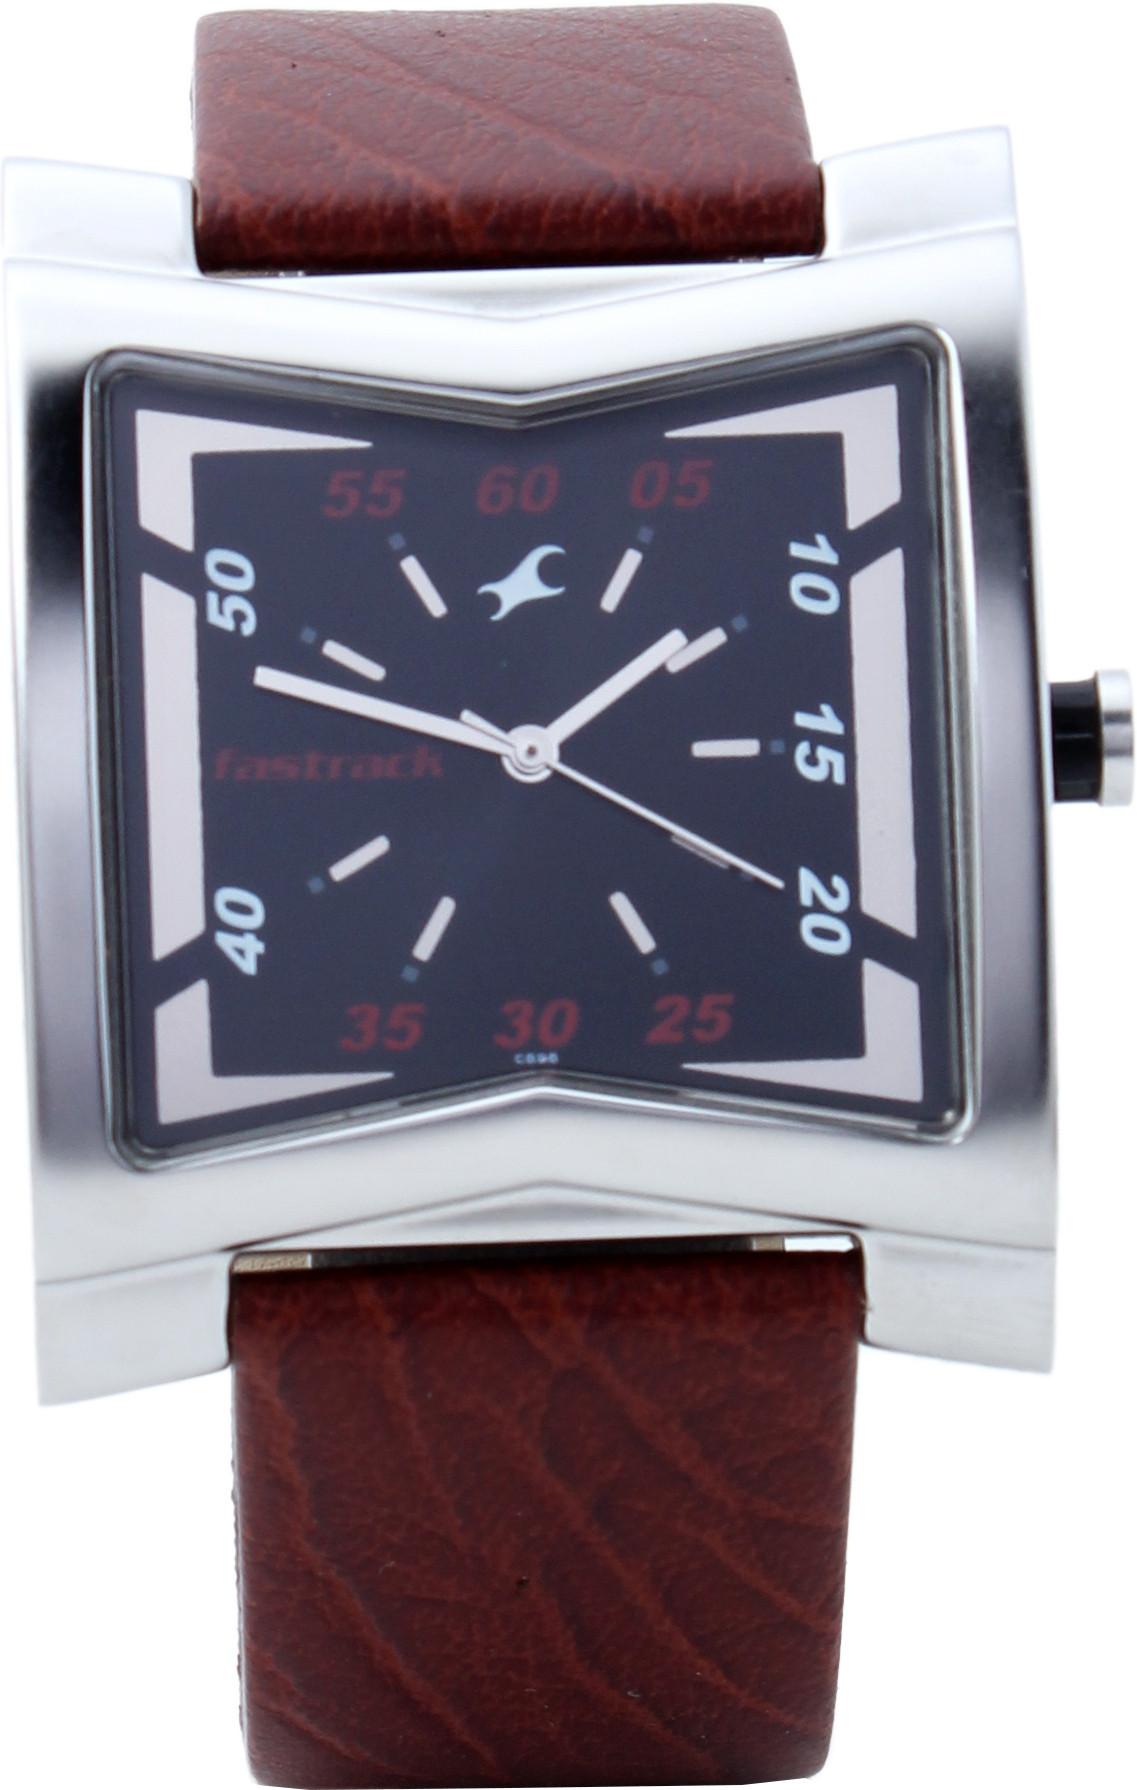 frast track watch for men price 1500